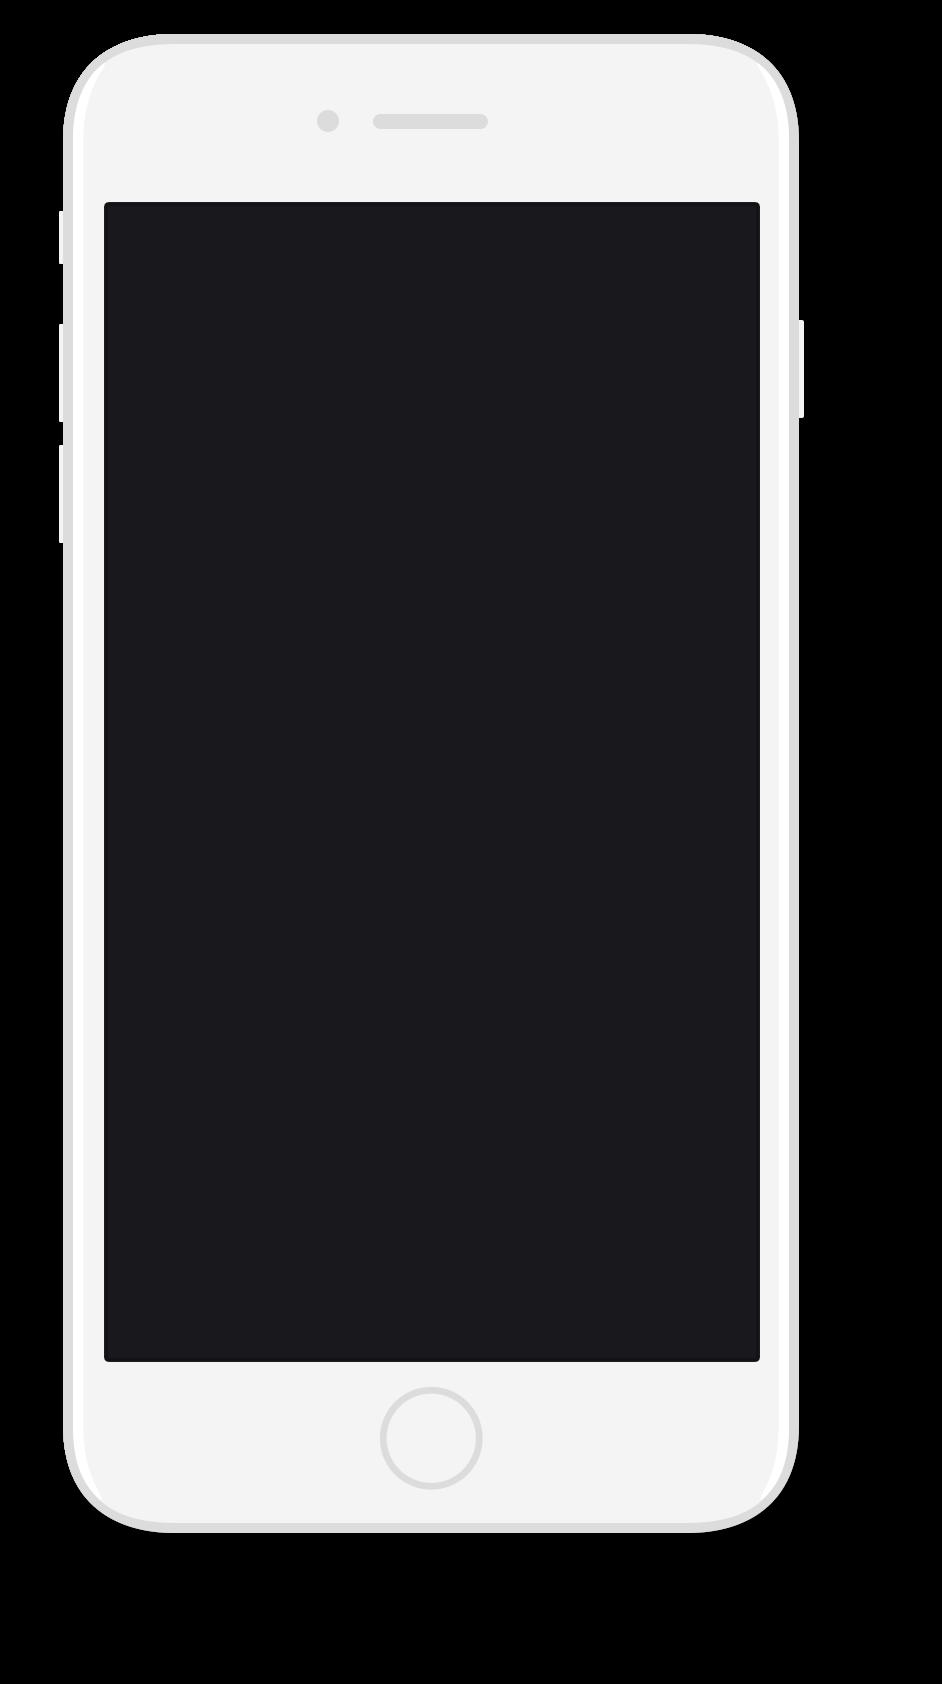 Big flat iPhone